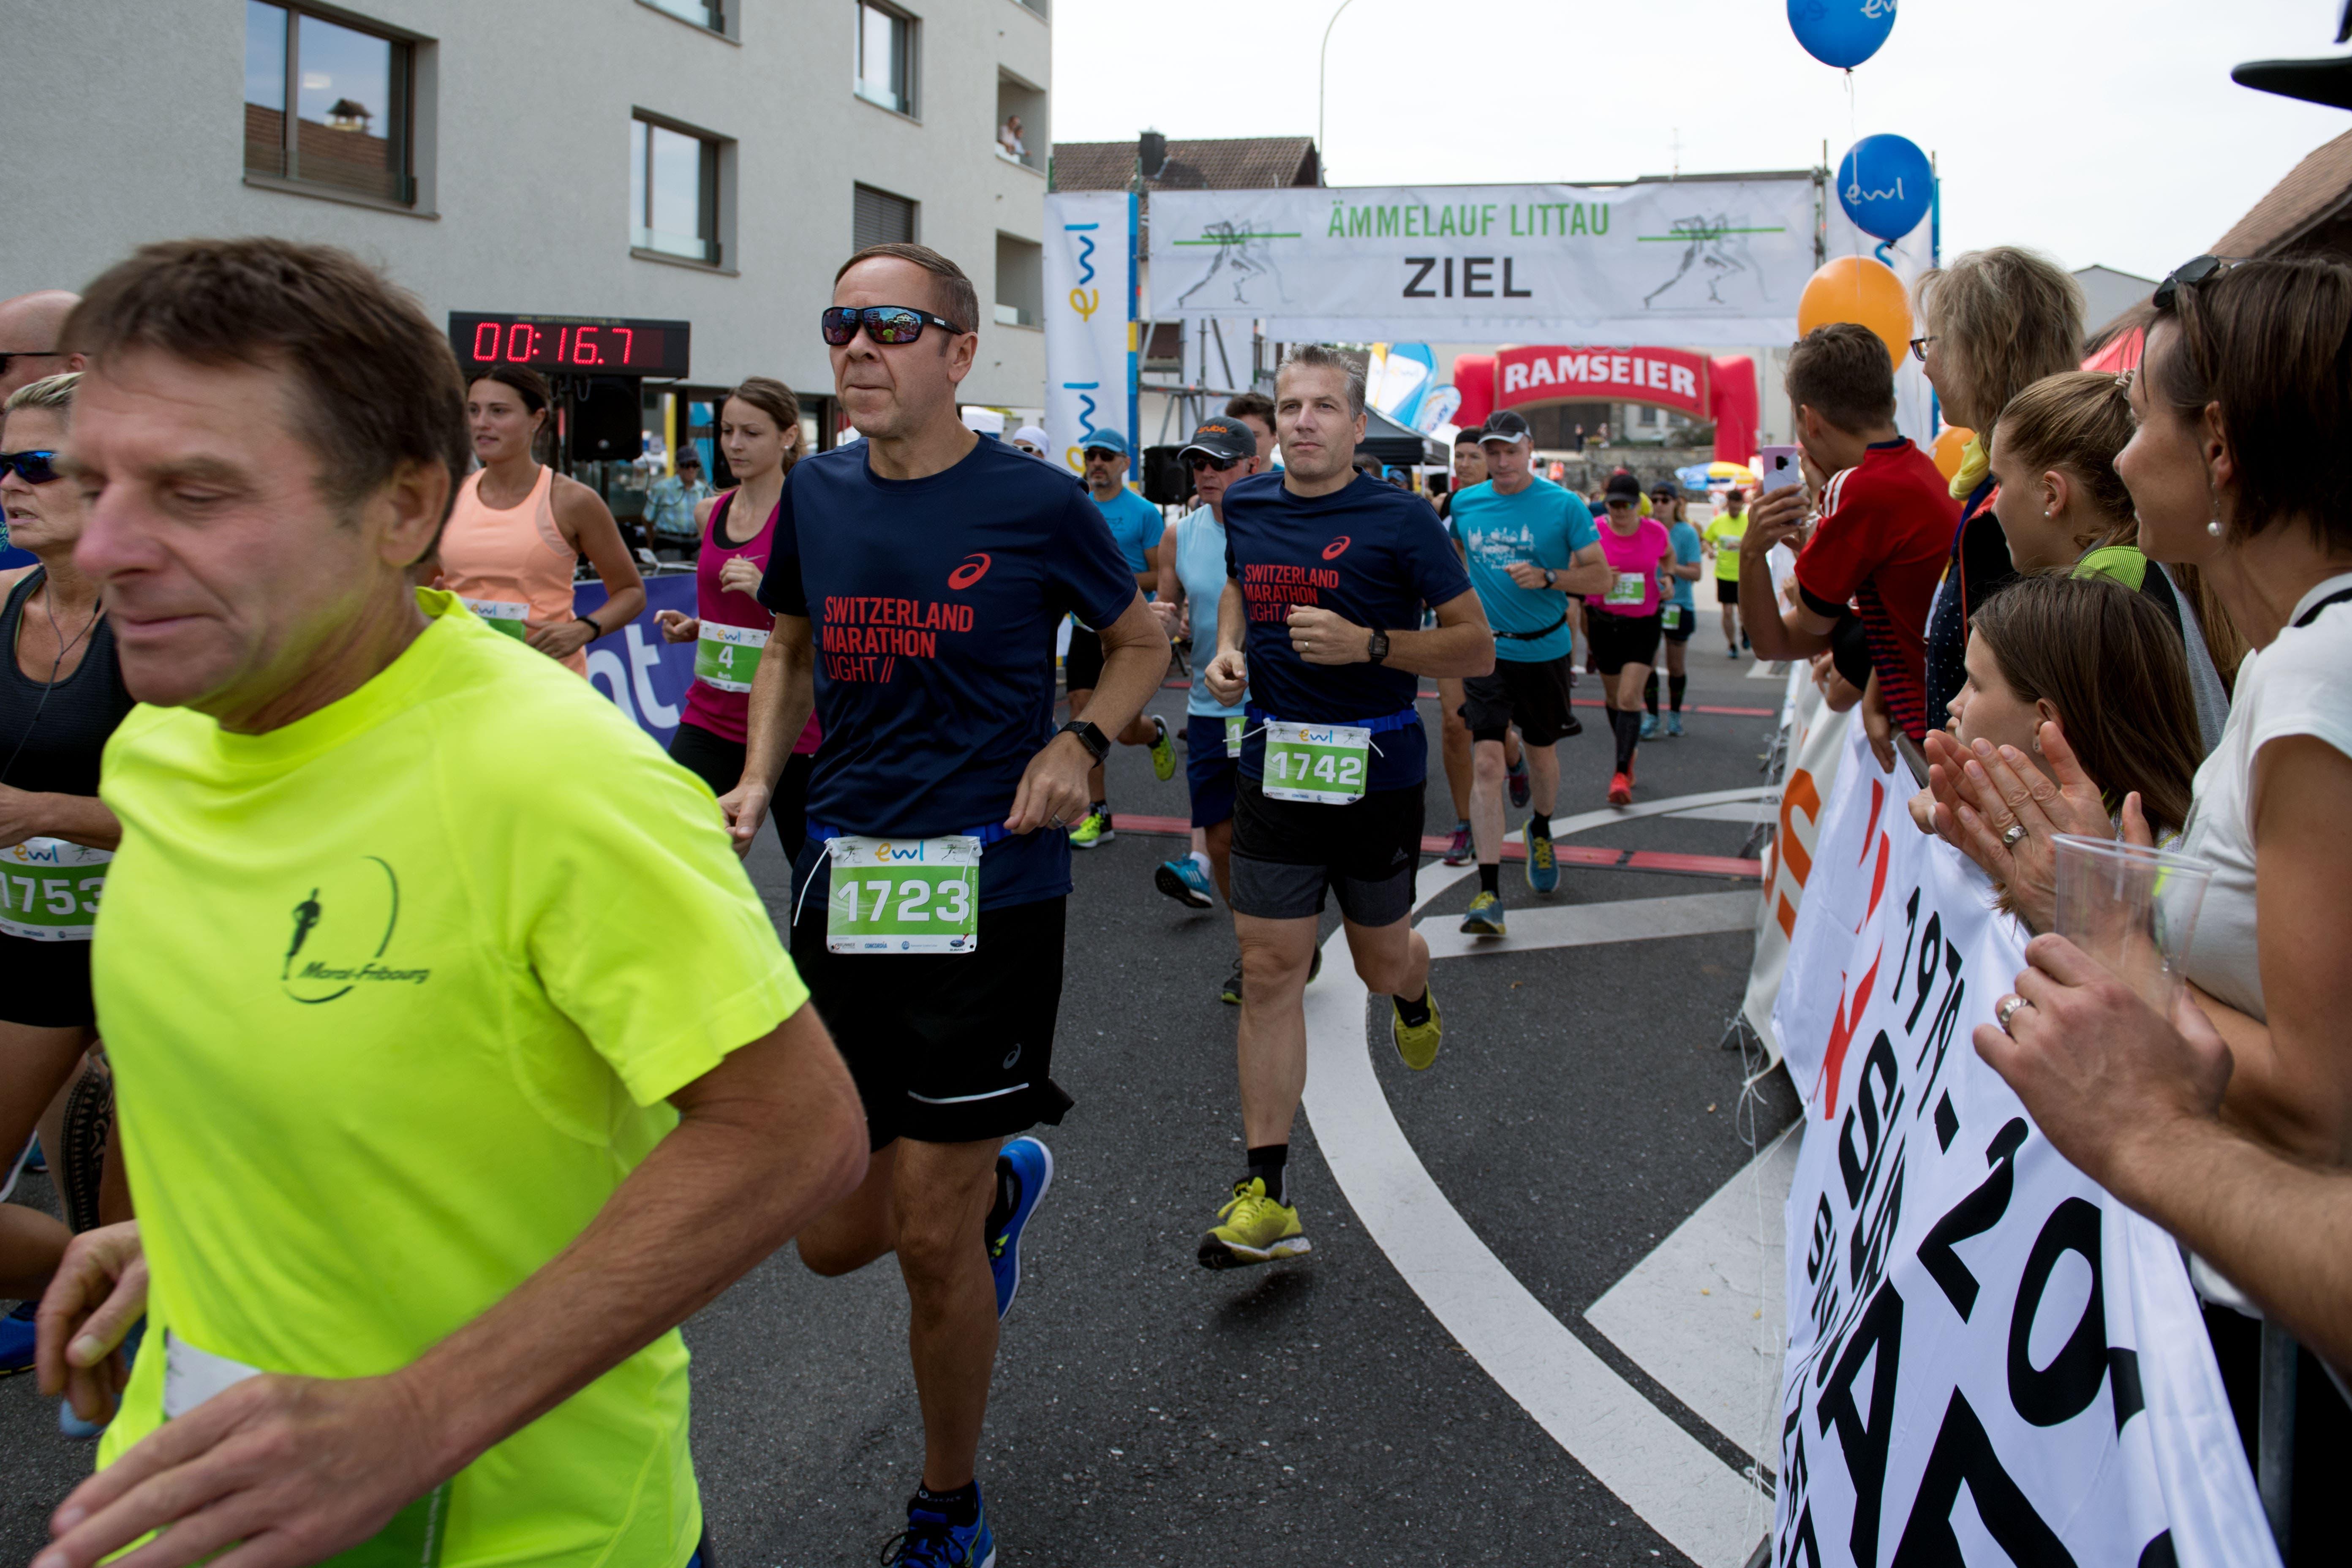 Stefan Dober aus Ebikon (links) und André Hagmann aus Root beim Start. (Bild: Eveline Beerkircher, Littau, 14. September 2019)